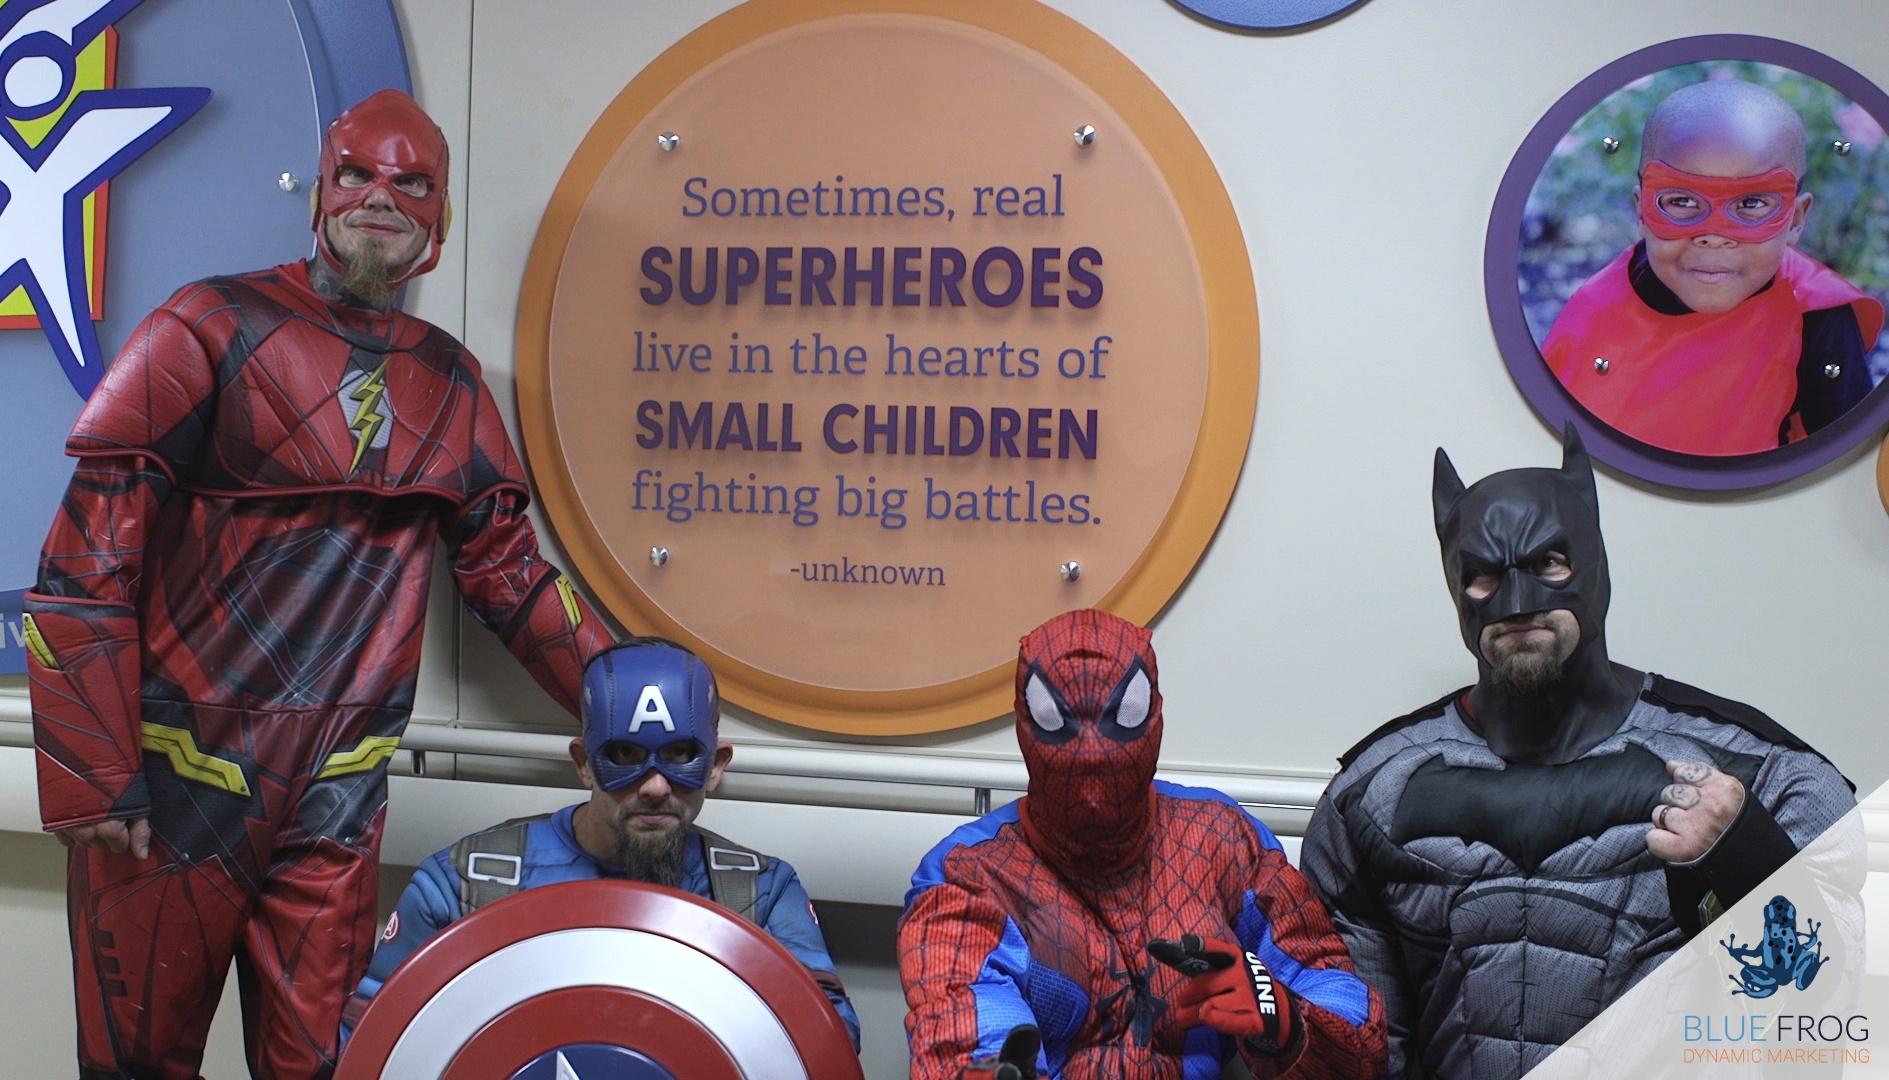 Superheros-sign